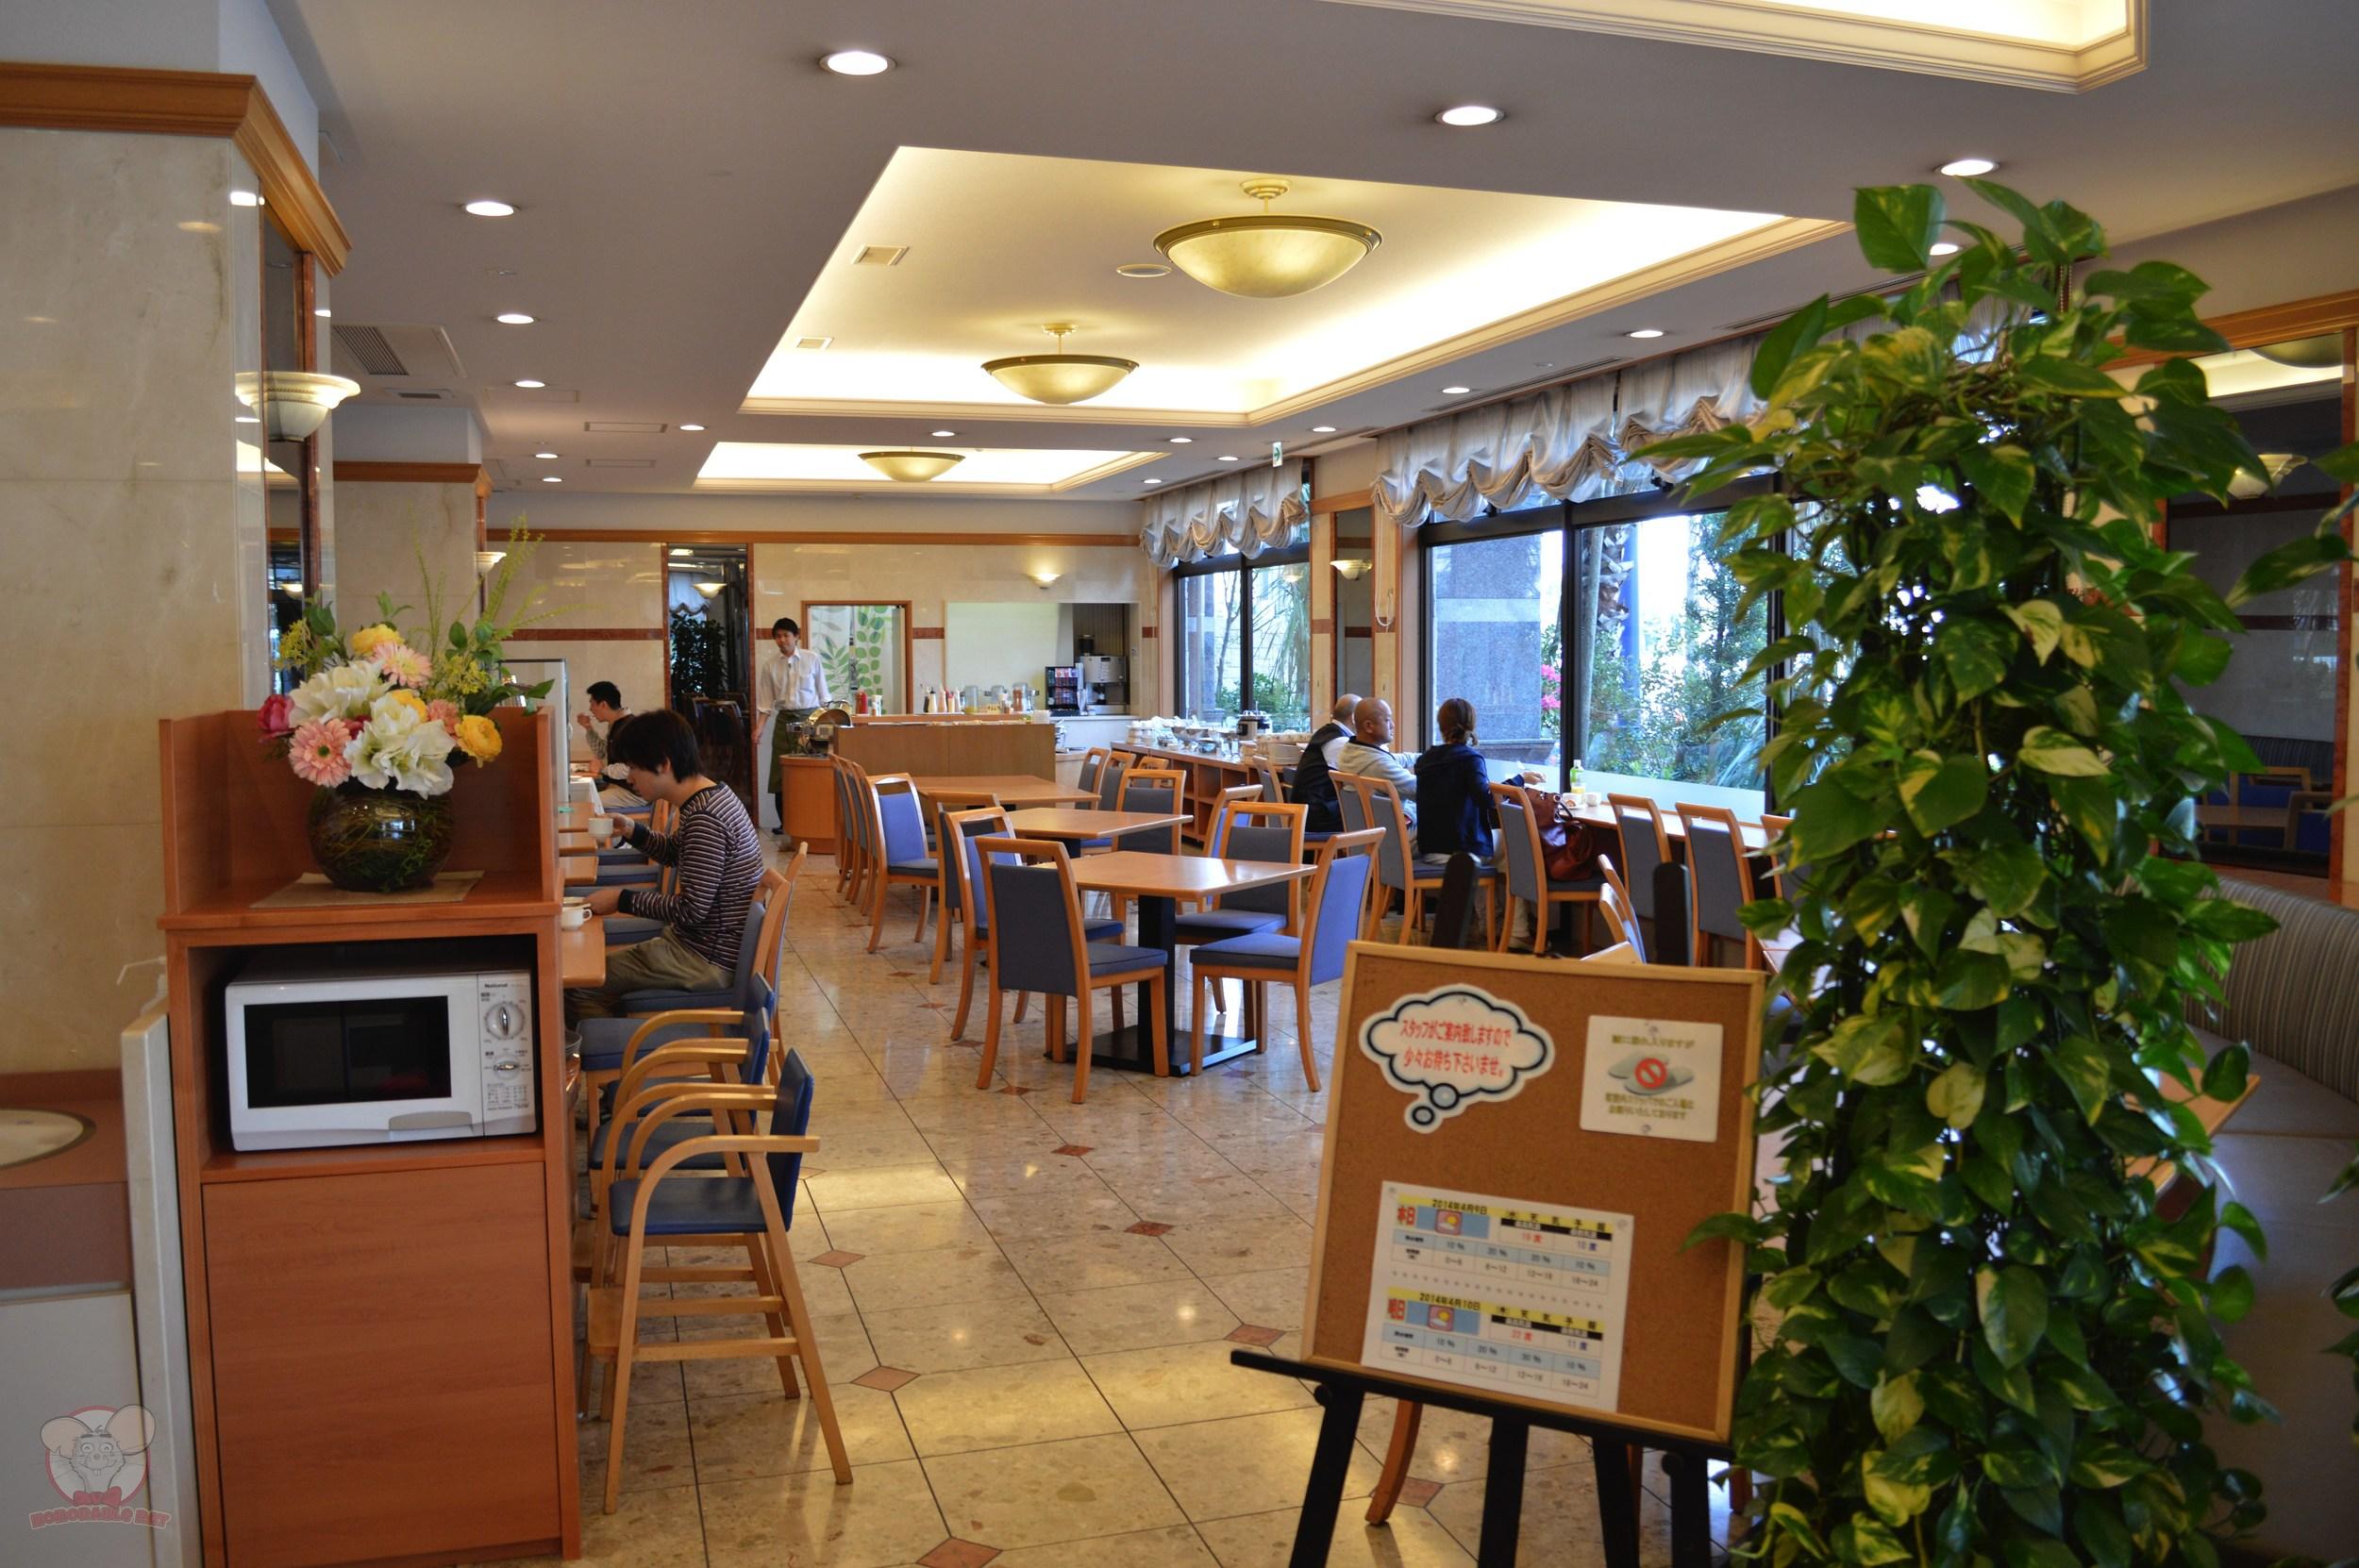 Breakfast Buffet area (1,100 yen foranyone aged 7 and over, 700 yen for children aged 3 – 6 and free for children under 2)